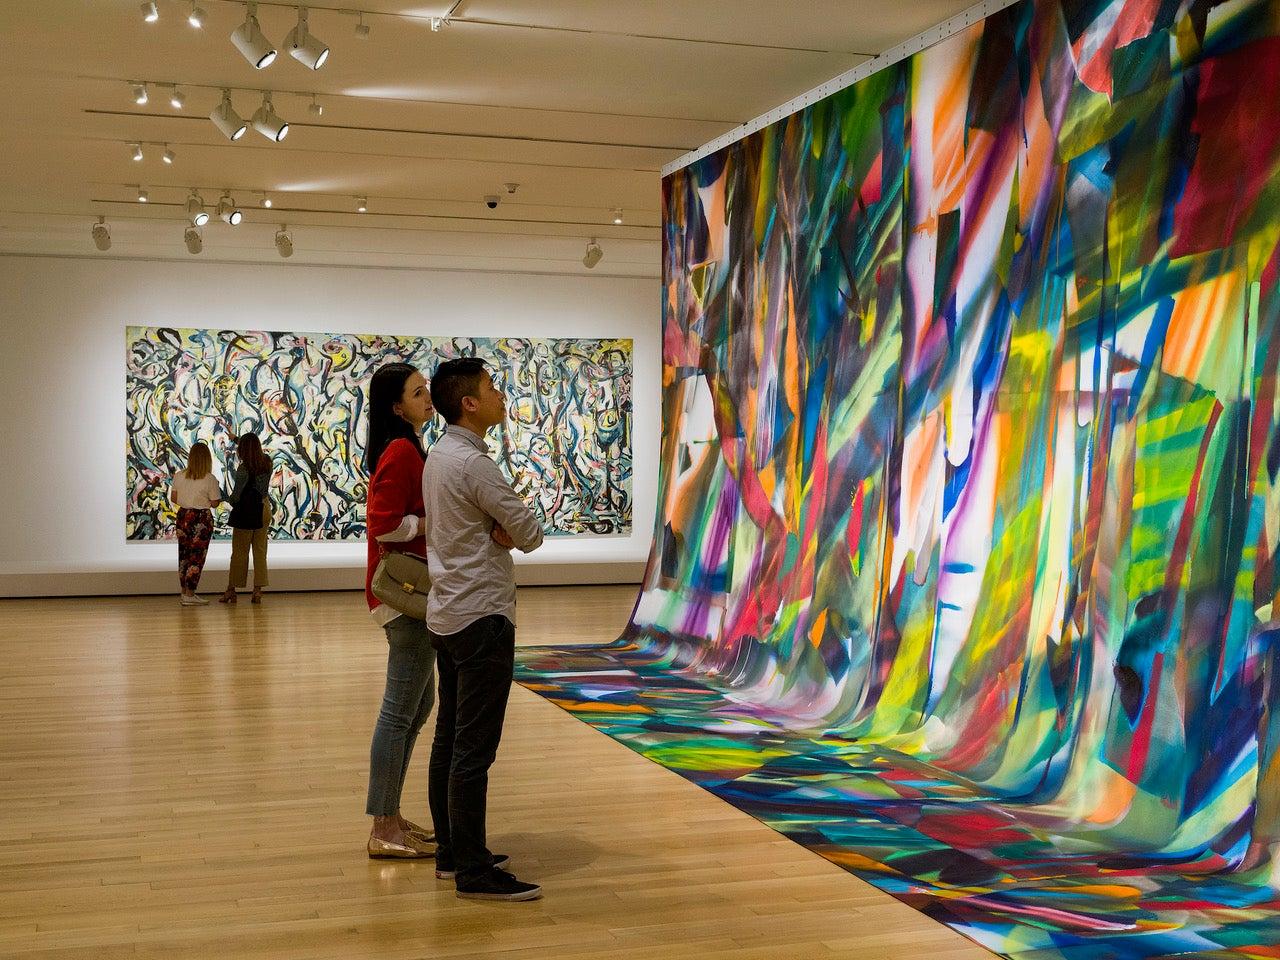 Mural: Jackson Pollock | Katharina Grosse